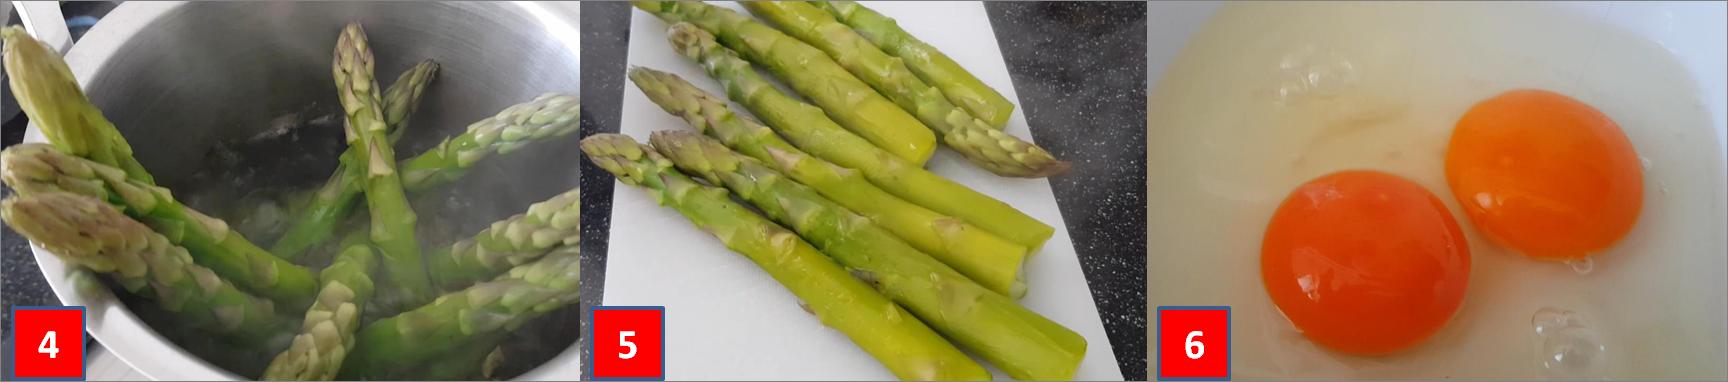 ricetta passo passo frittatine di asparagi 2